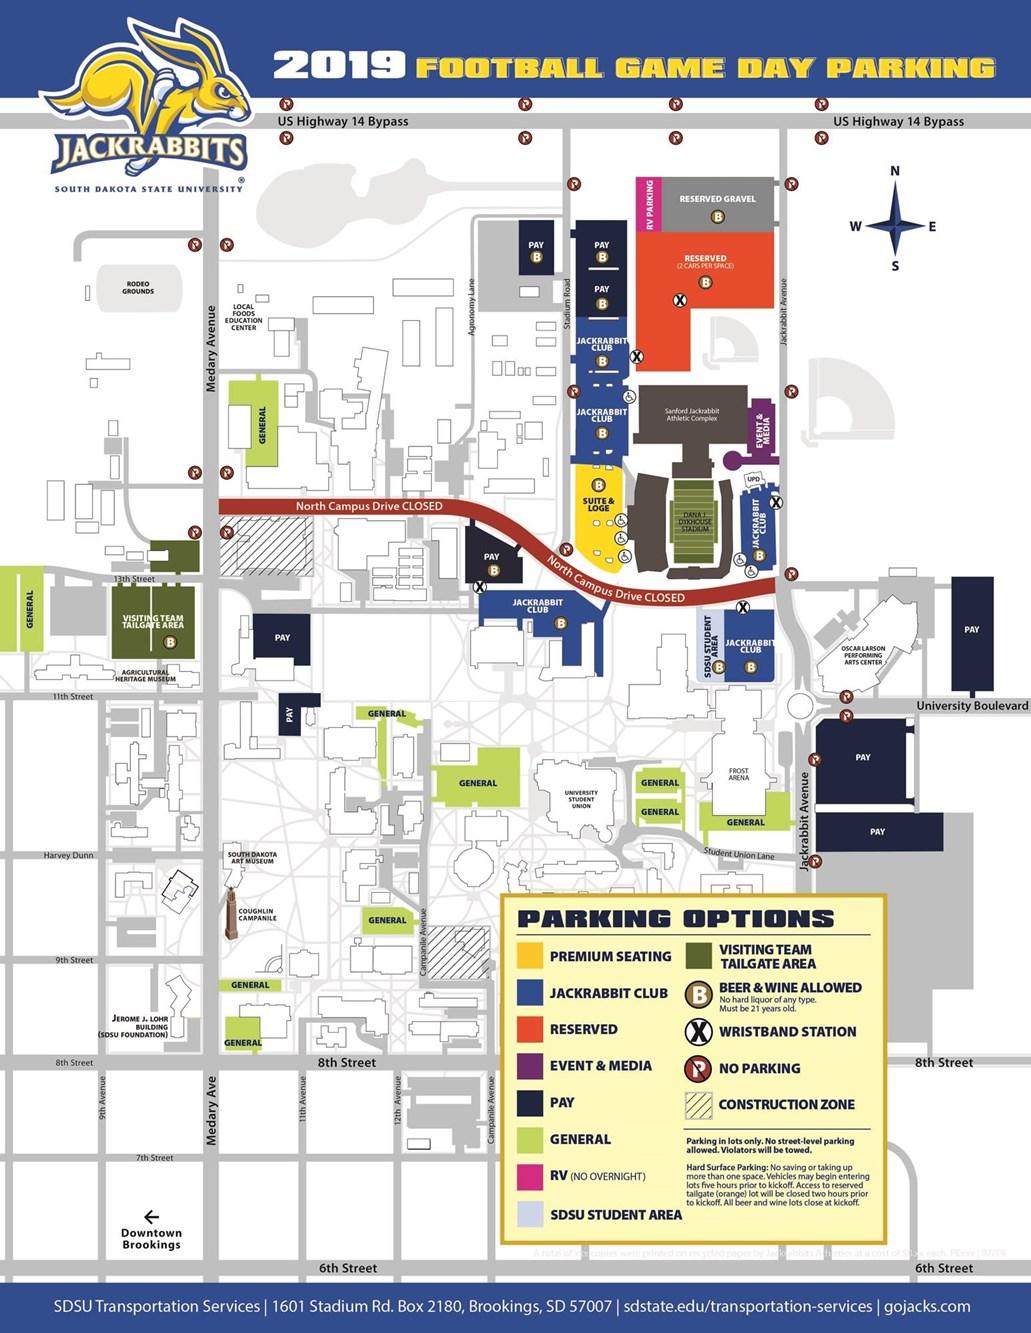 sd state campus map Student Tailgating Information South Dakota State University